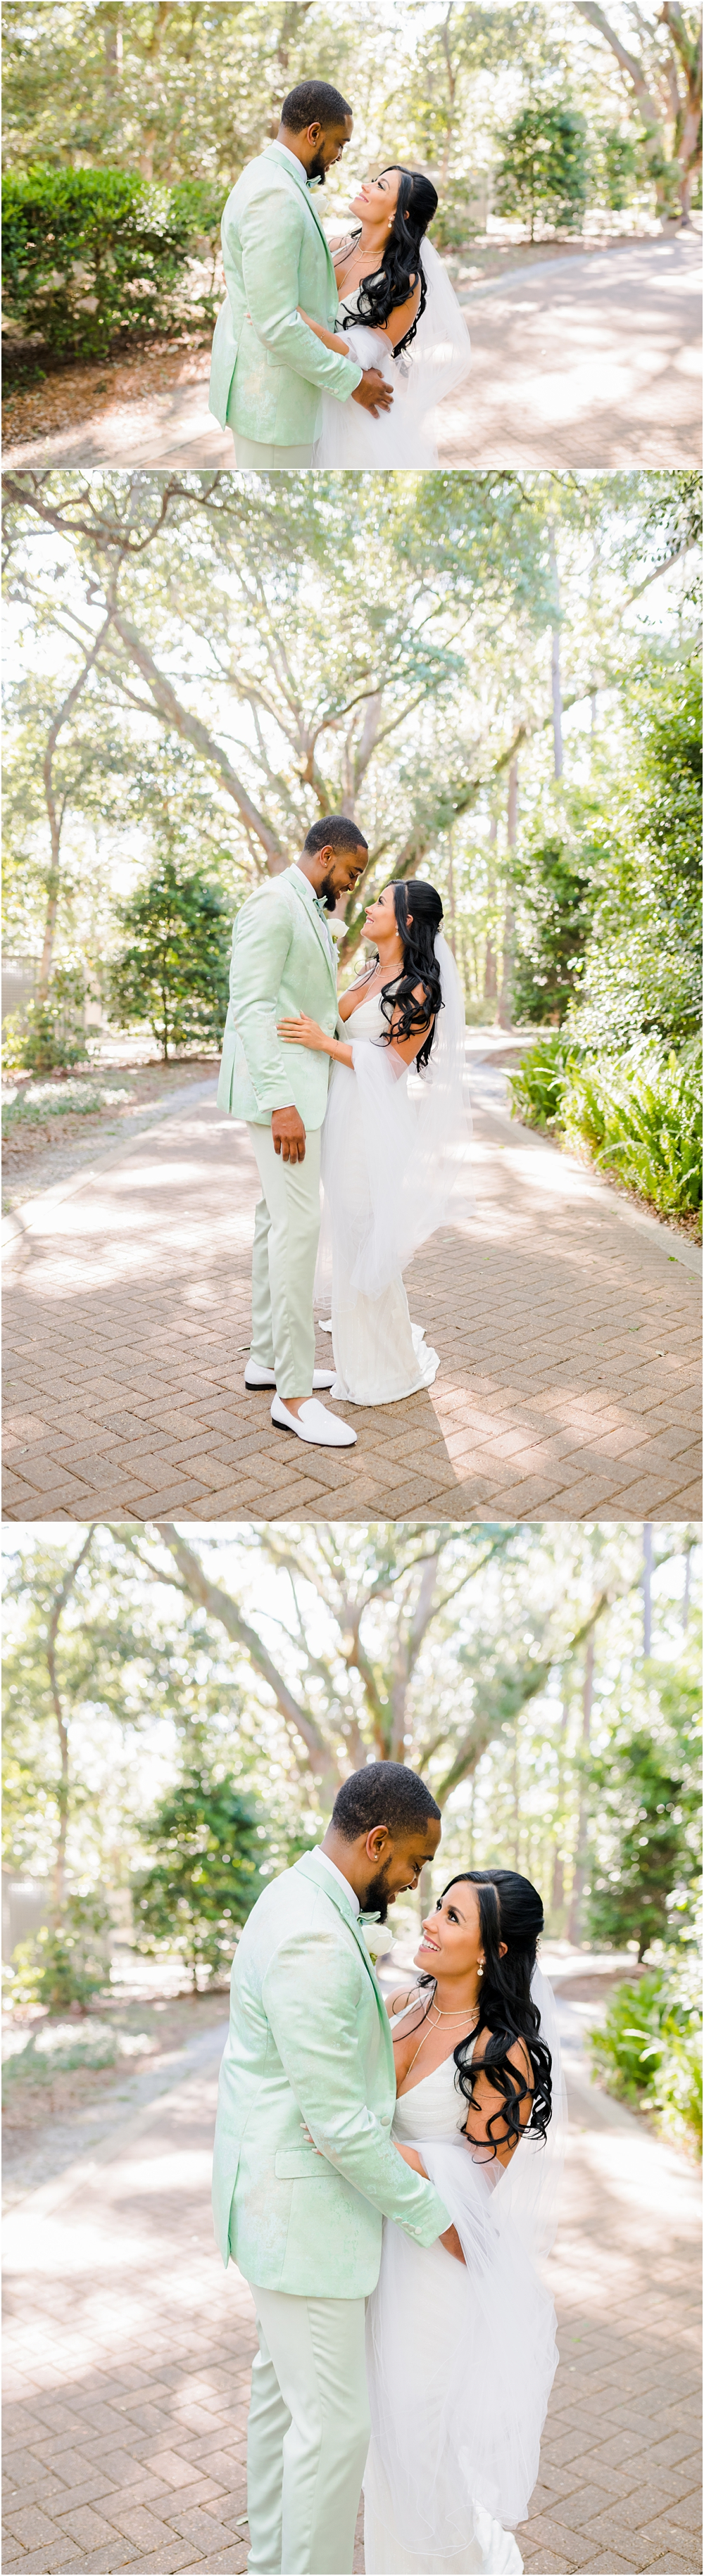 green-eden-gardens-florida-wedding-kiersten-stevenson-photography68.jpg